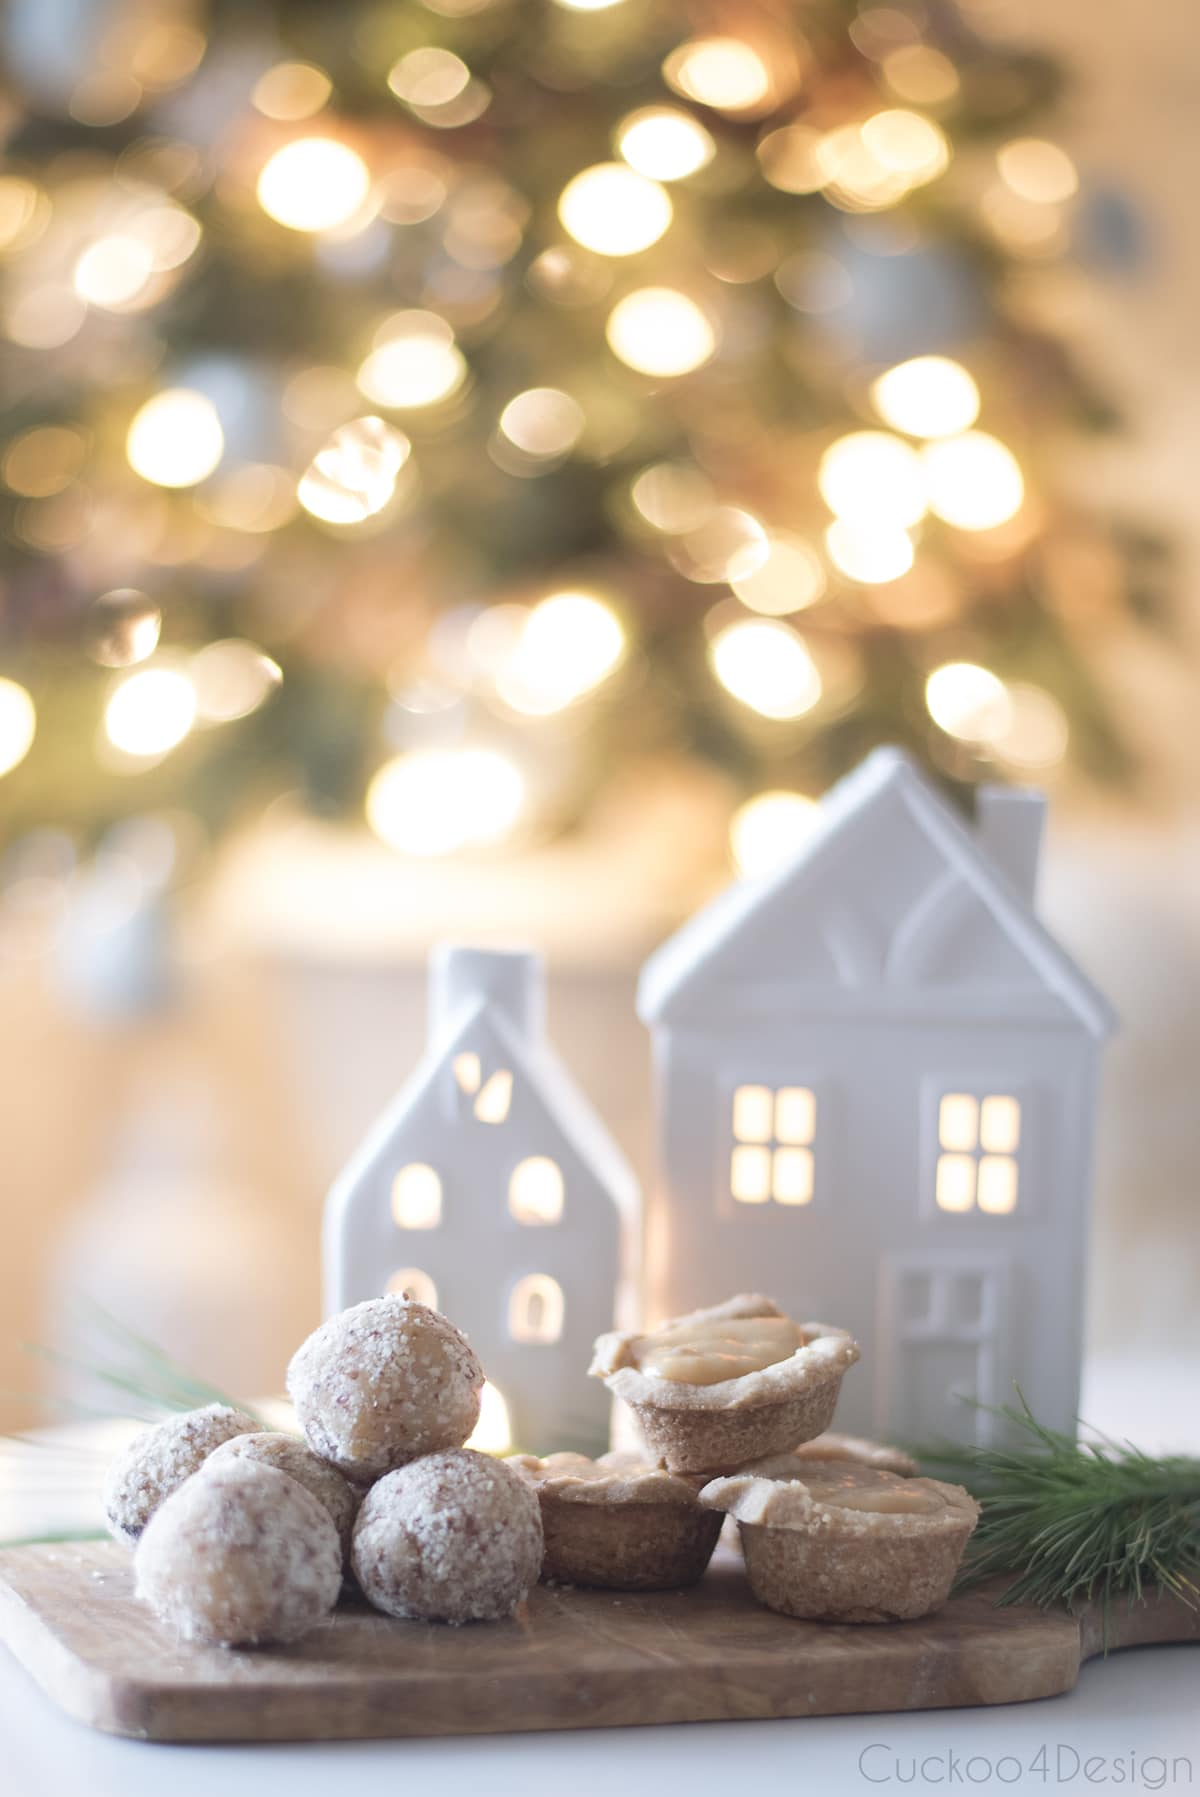 Christmas toffee tassies recipe